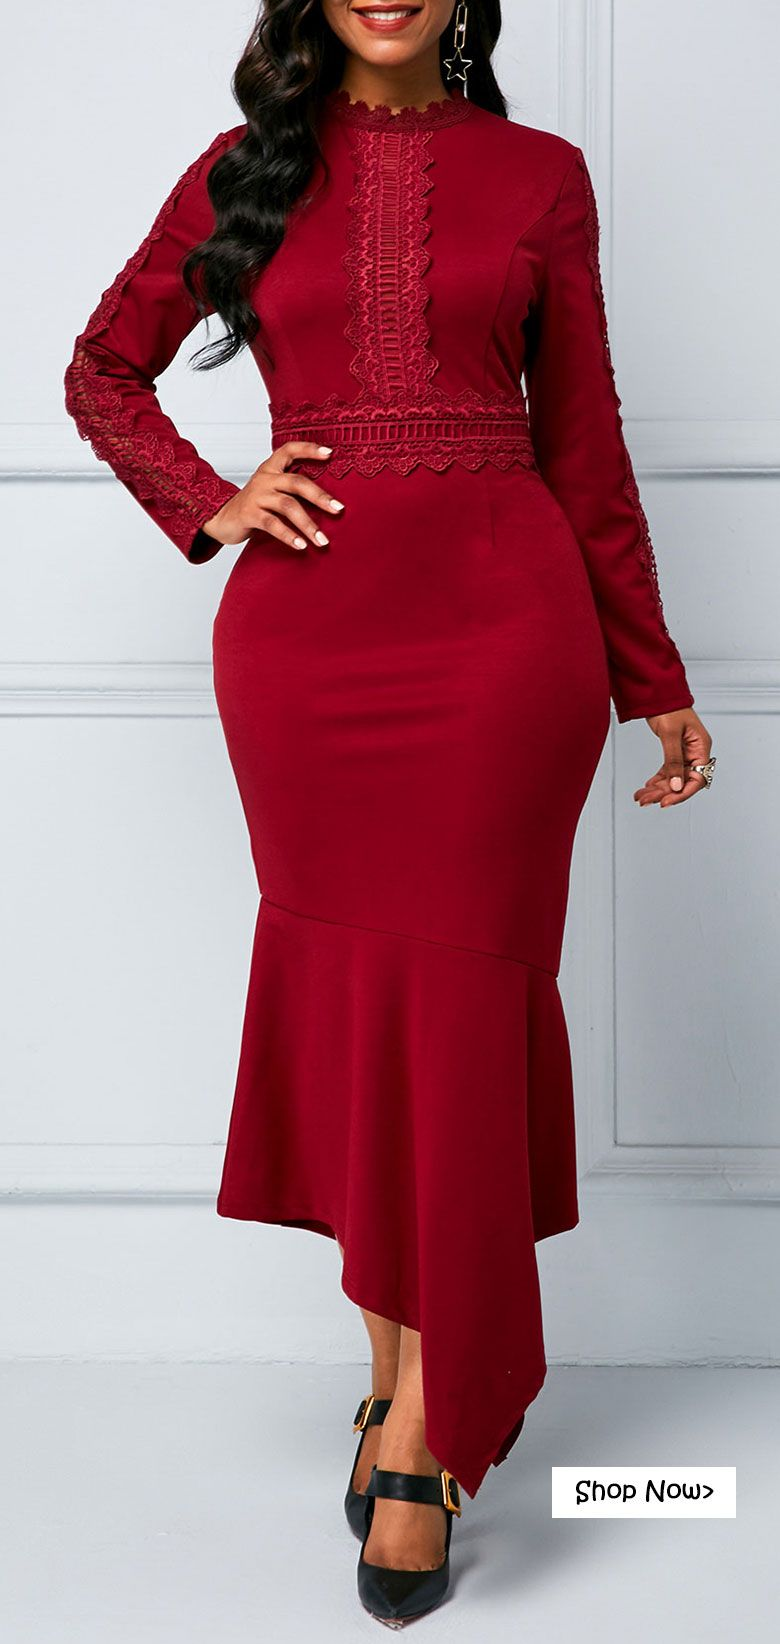 Long sleeve zipper back sheath dress in christmas outfits